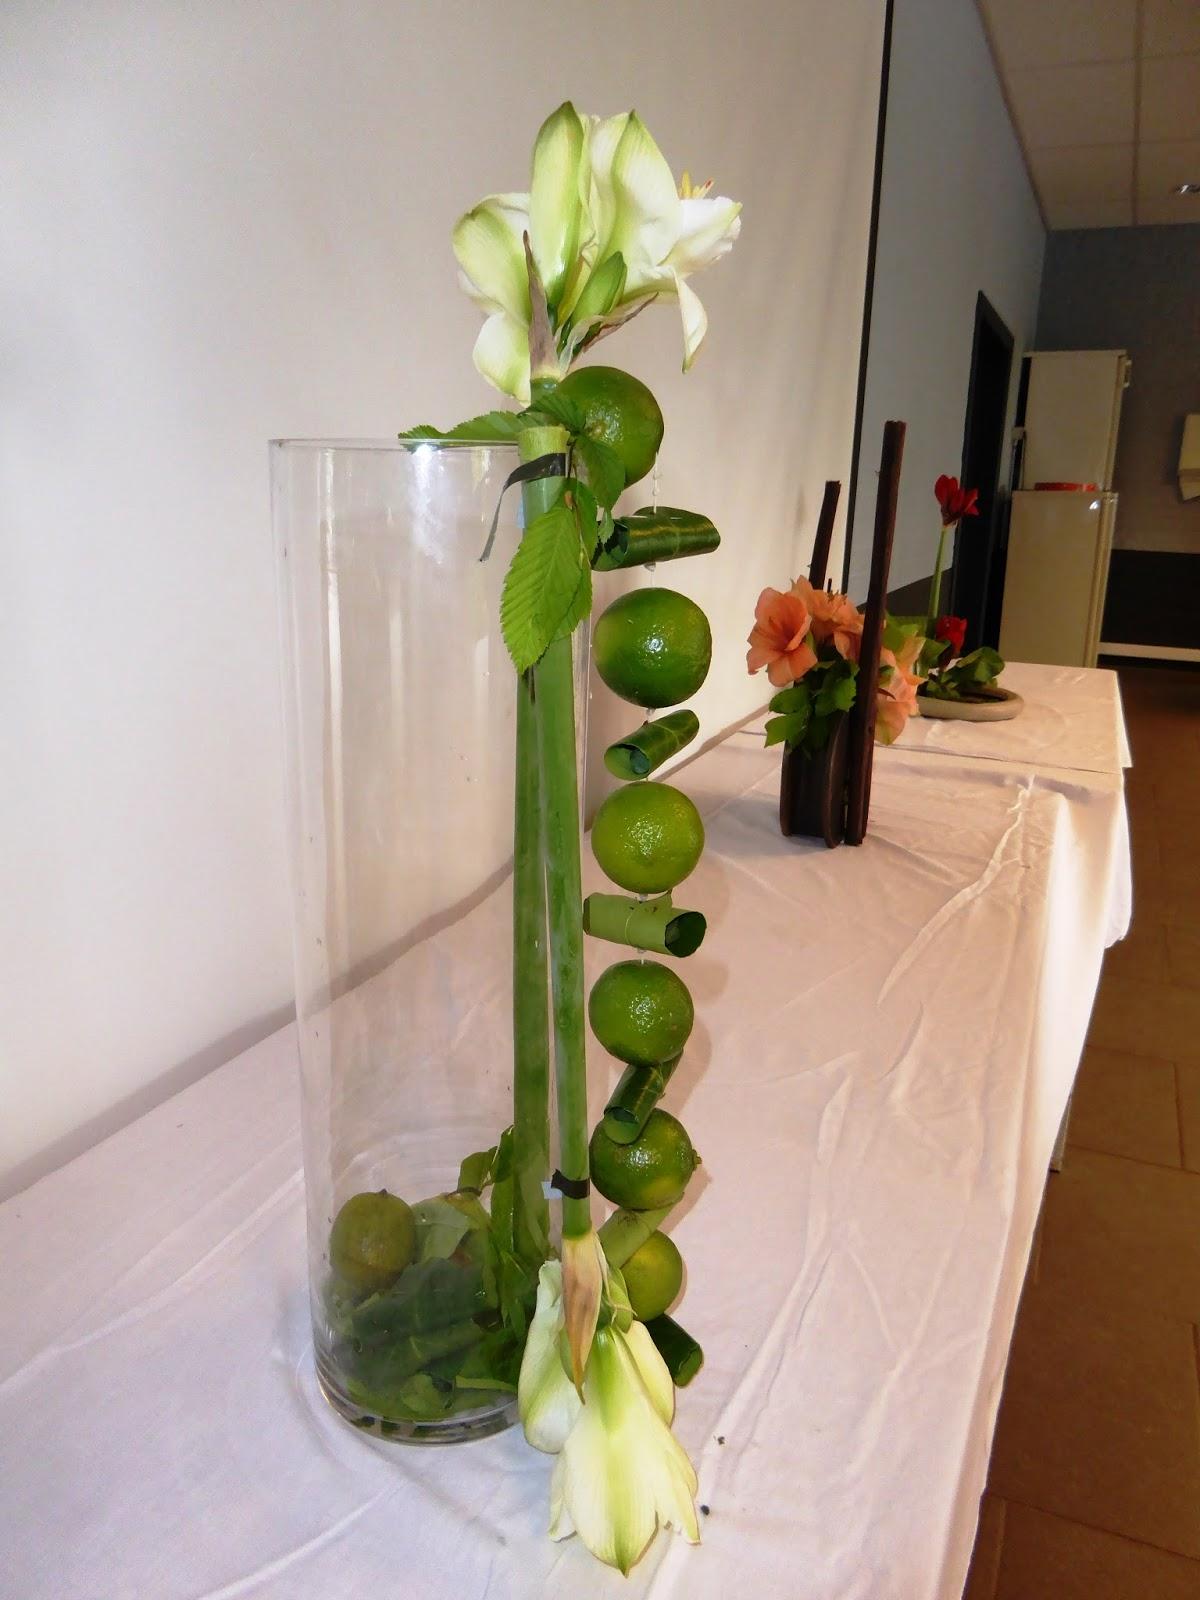 atelier d 39 art floral la d tente variations modernes avec des amaryllis. Black Bedroom Furniture Sets. Home Design Ideas